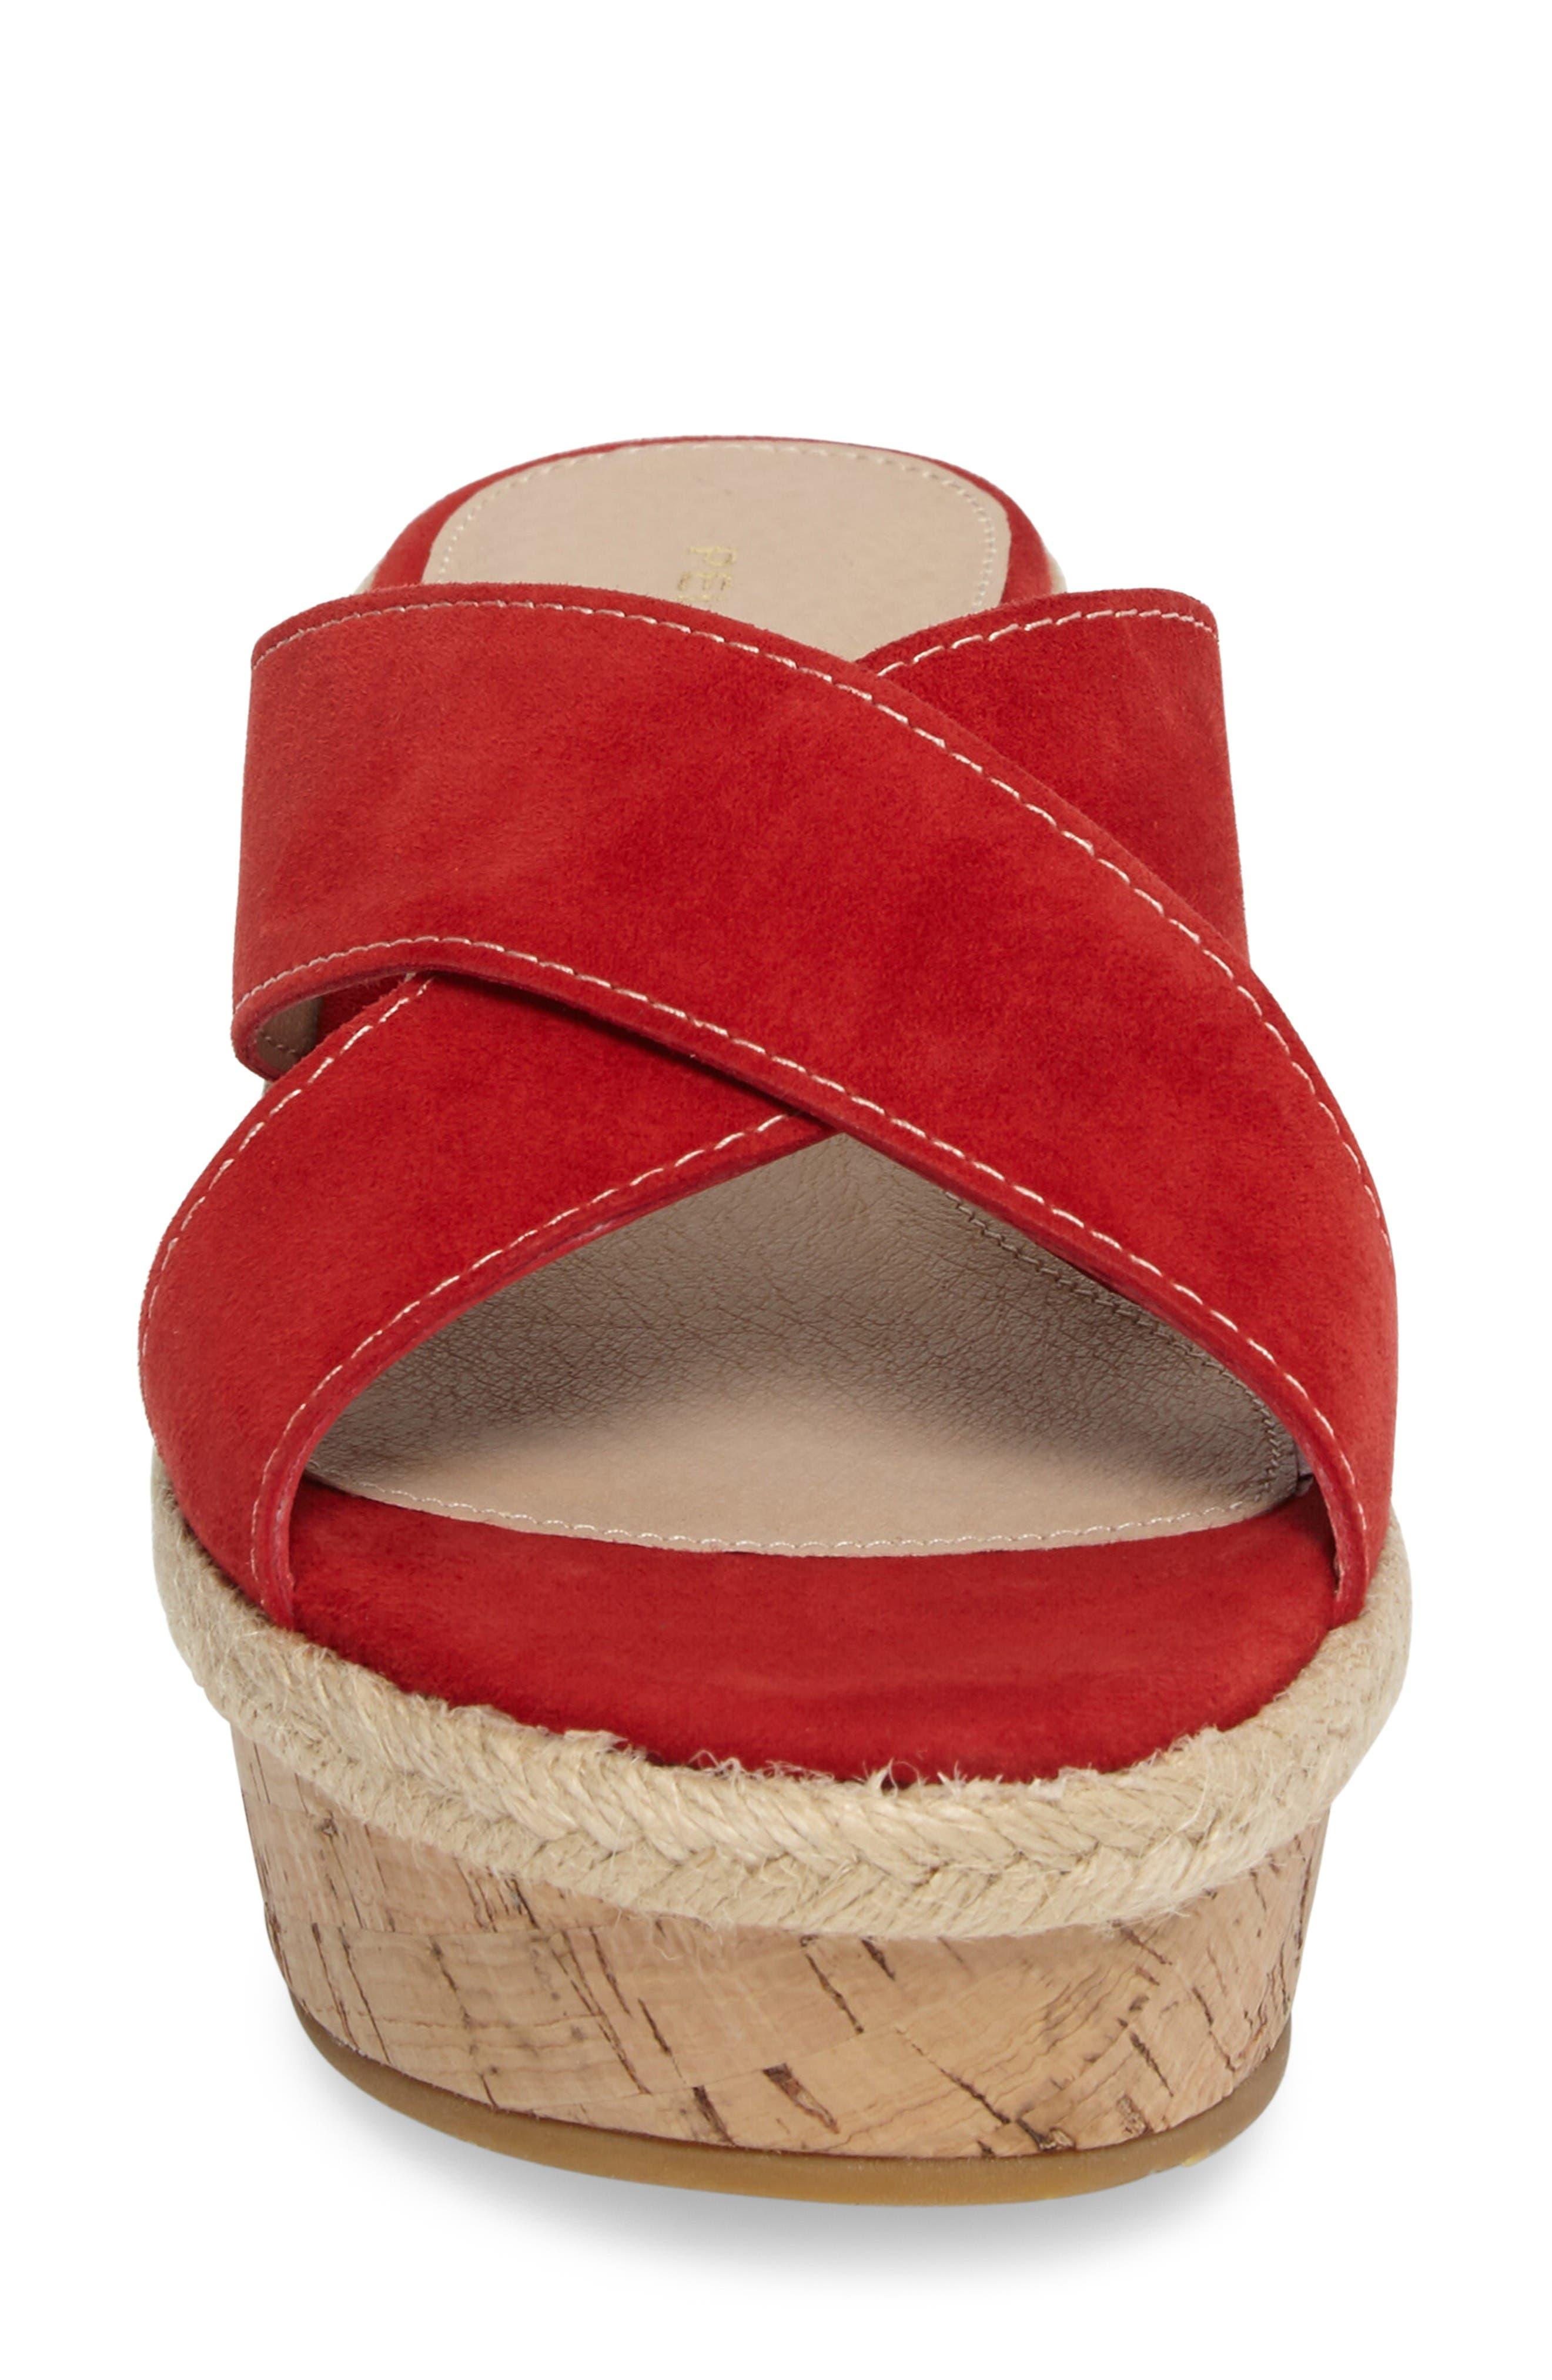 Harriet Platform Wedge Sandal,                             Alternate thumbnail 4, color,                             Lipstick Leather